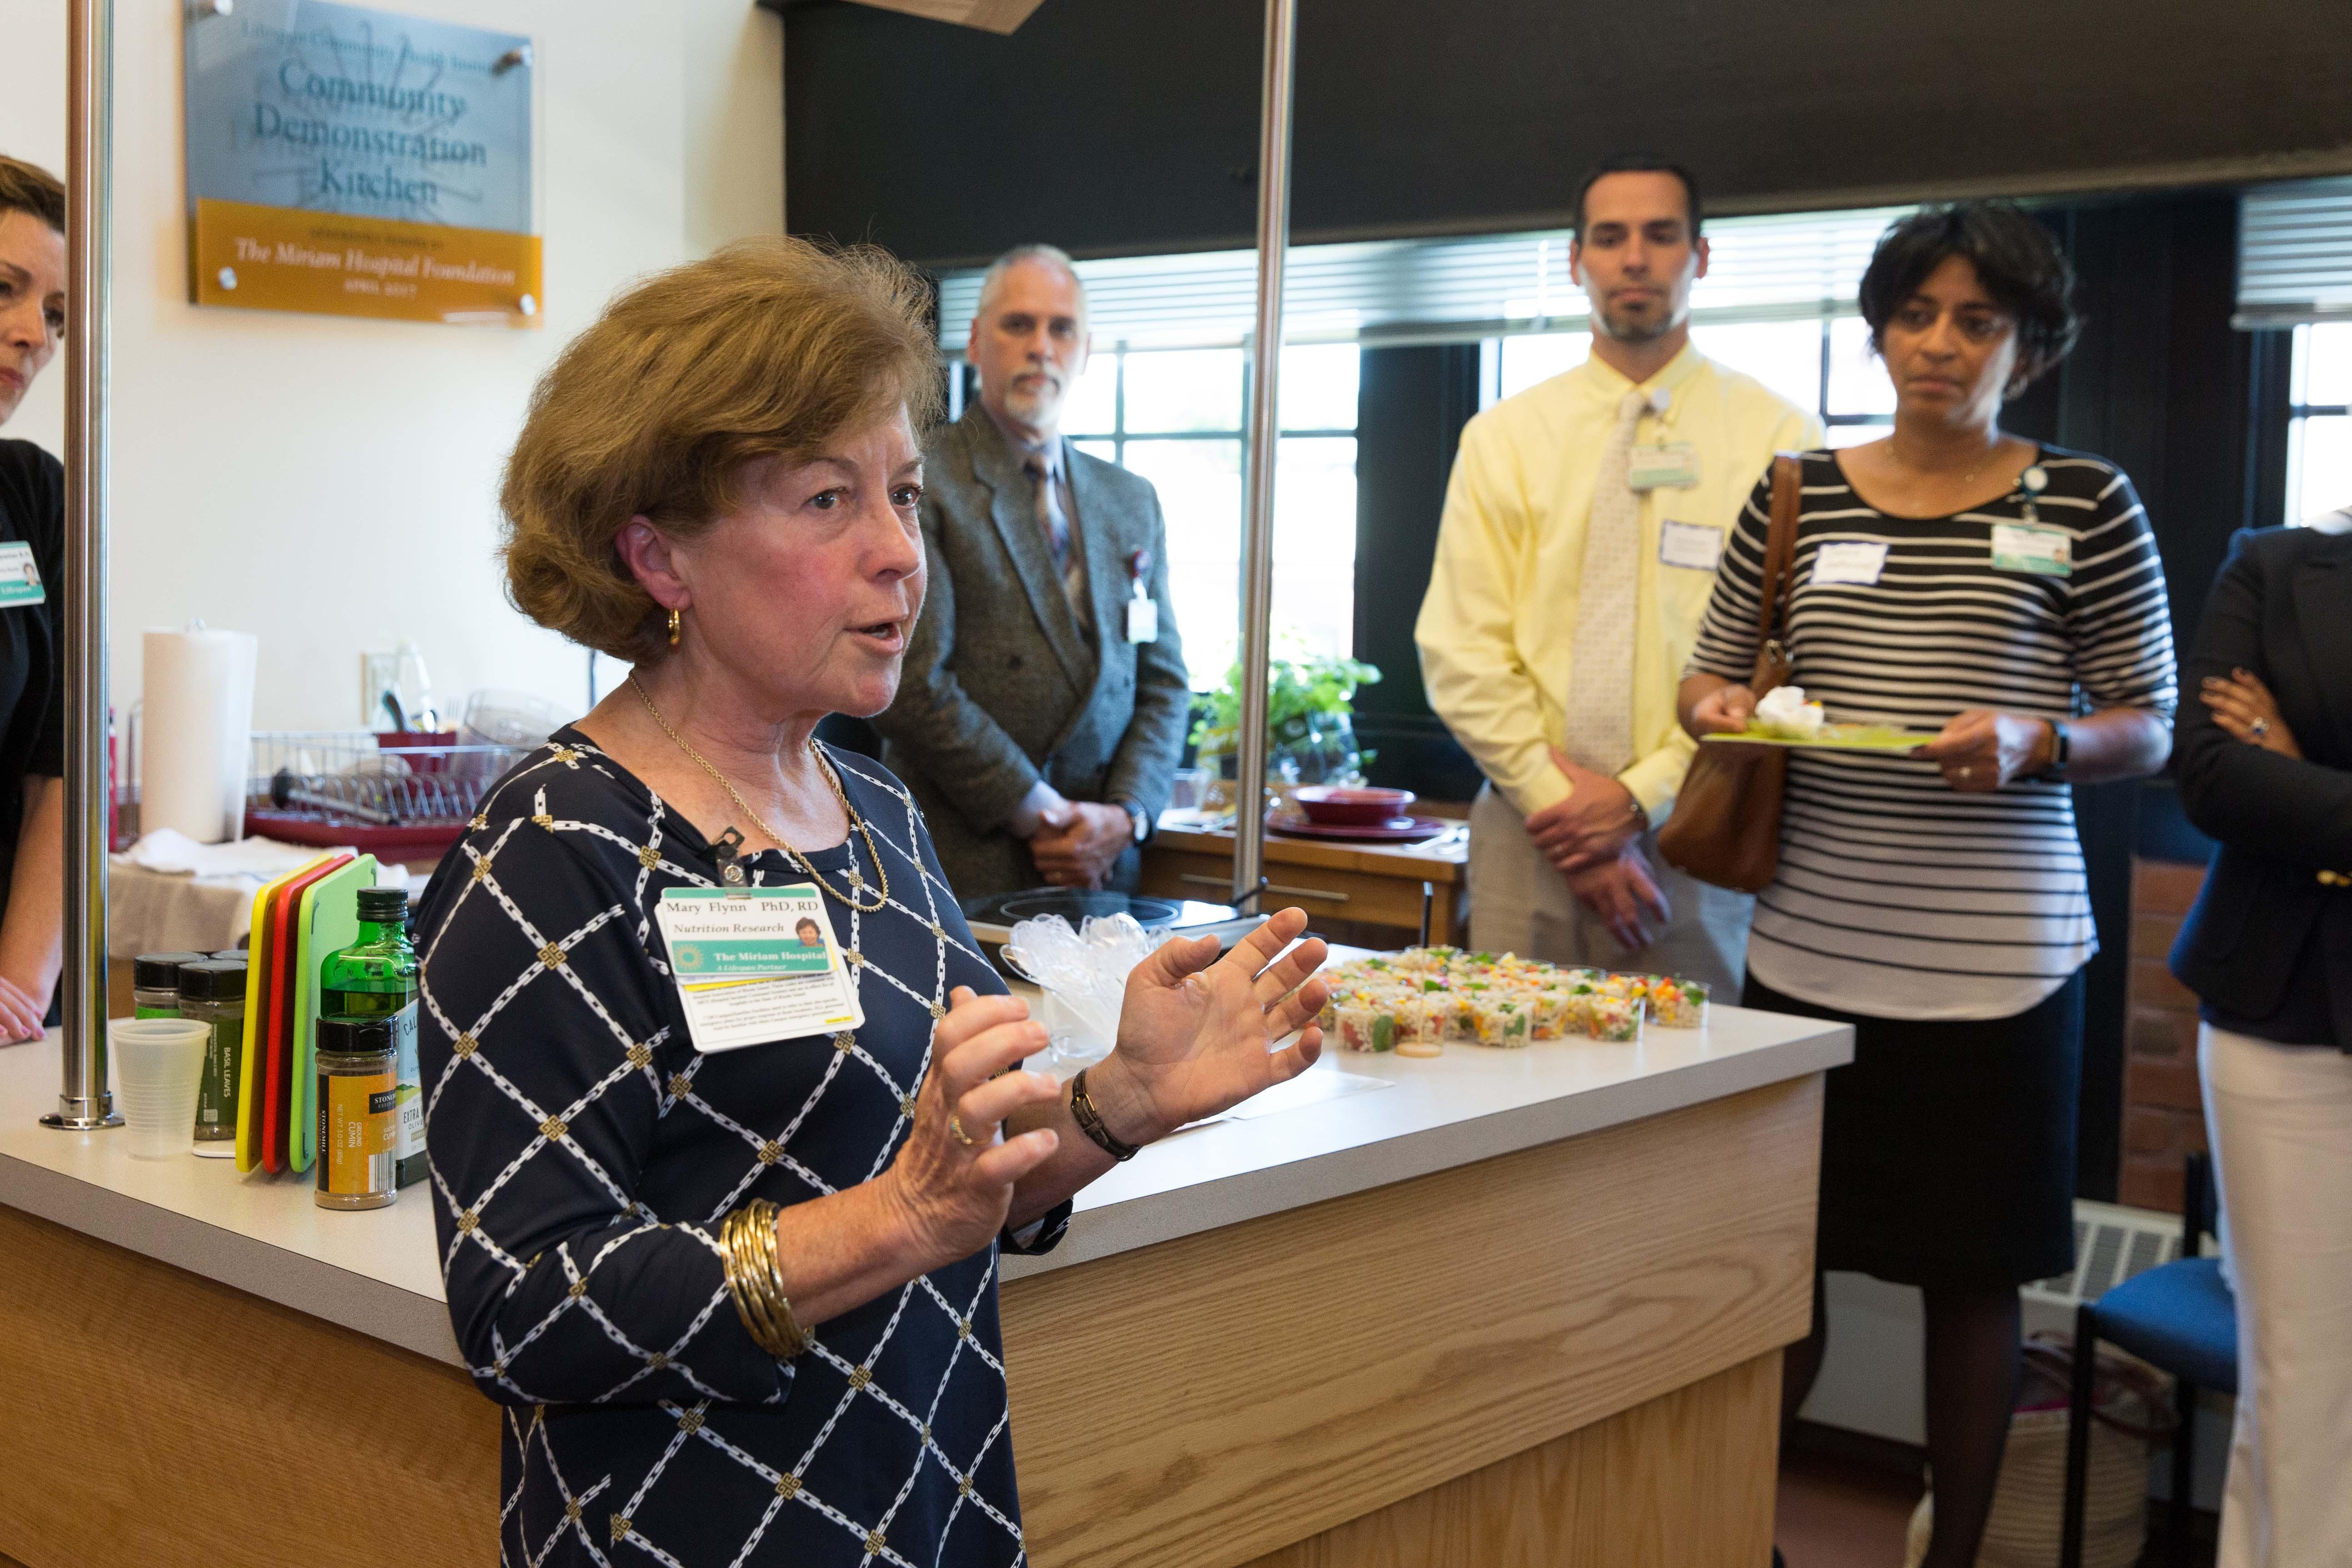 Demonstration Kitchen community demonstration kitchen | lifespan lifespan community